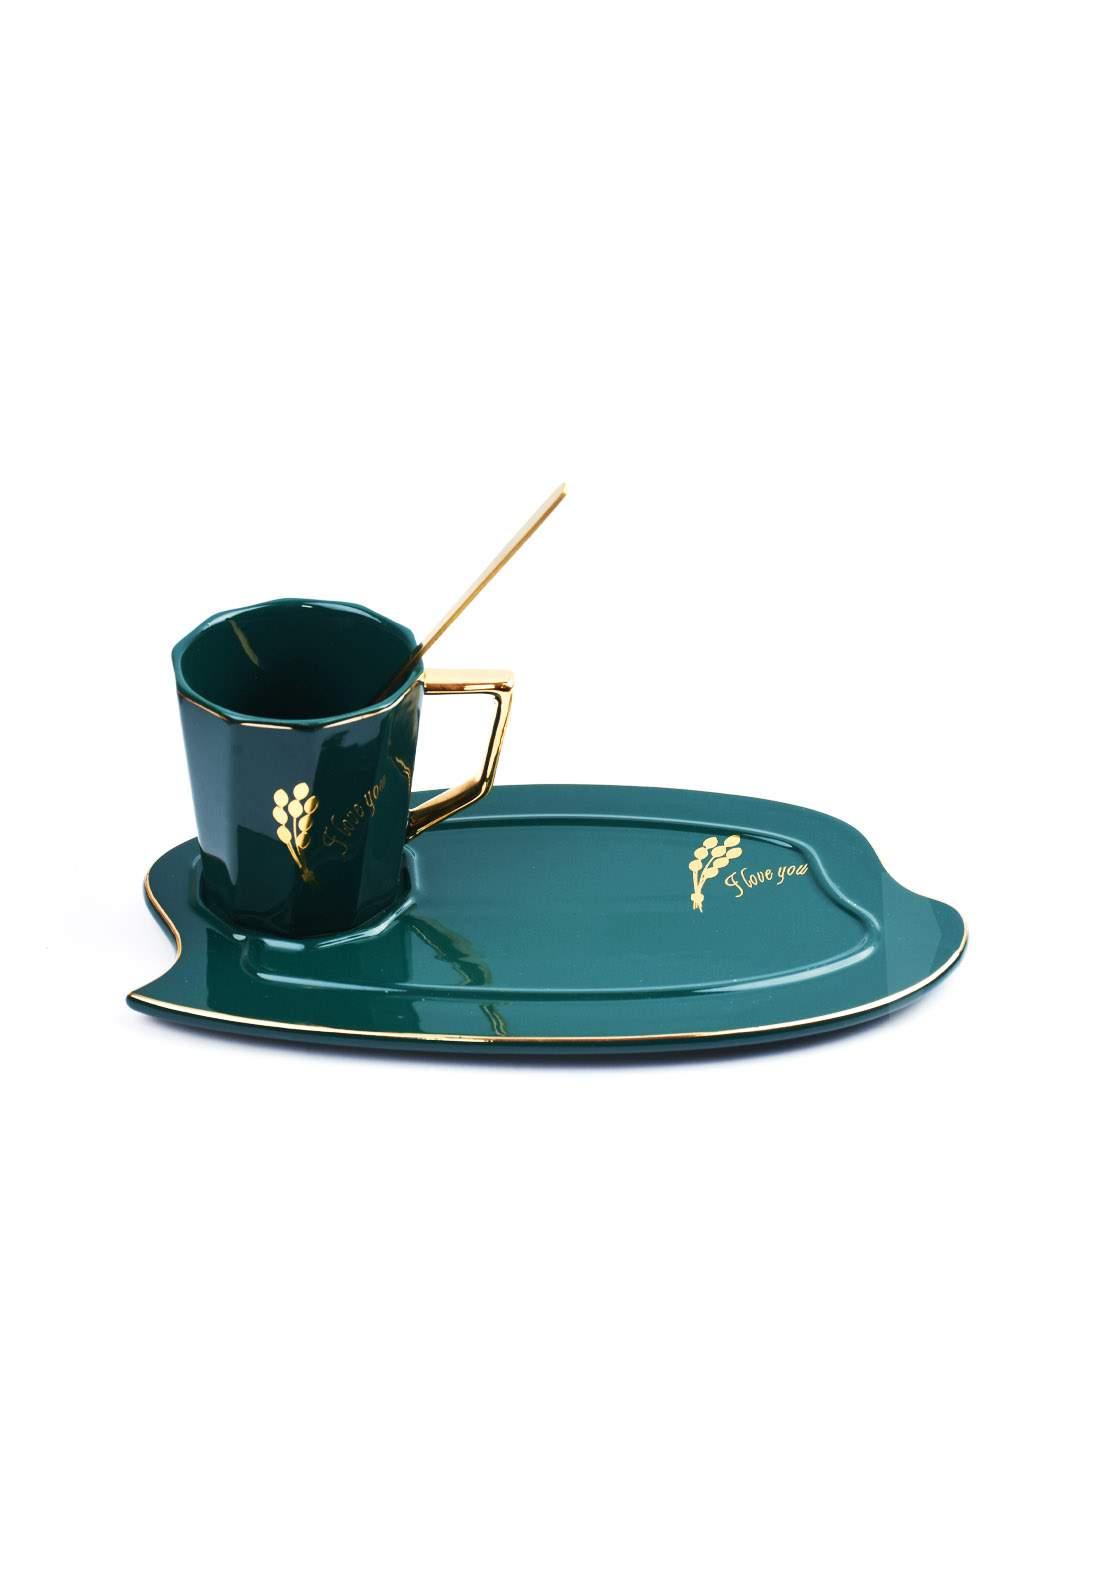 cup of coffee كوب قهوة زيتوني اللون